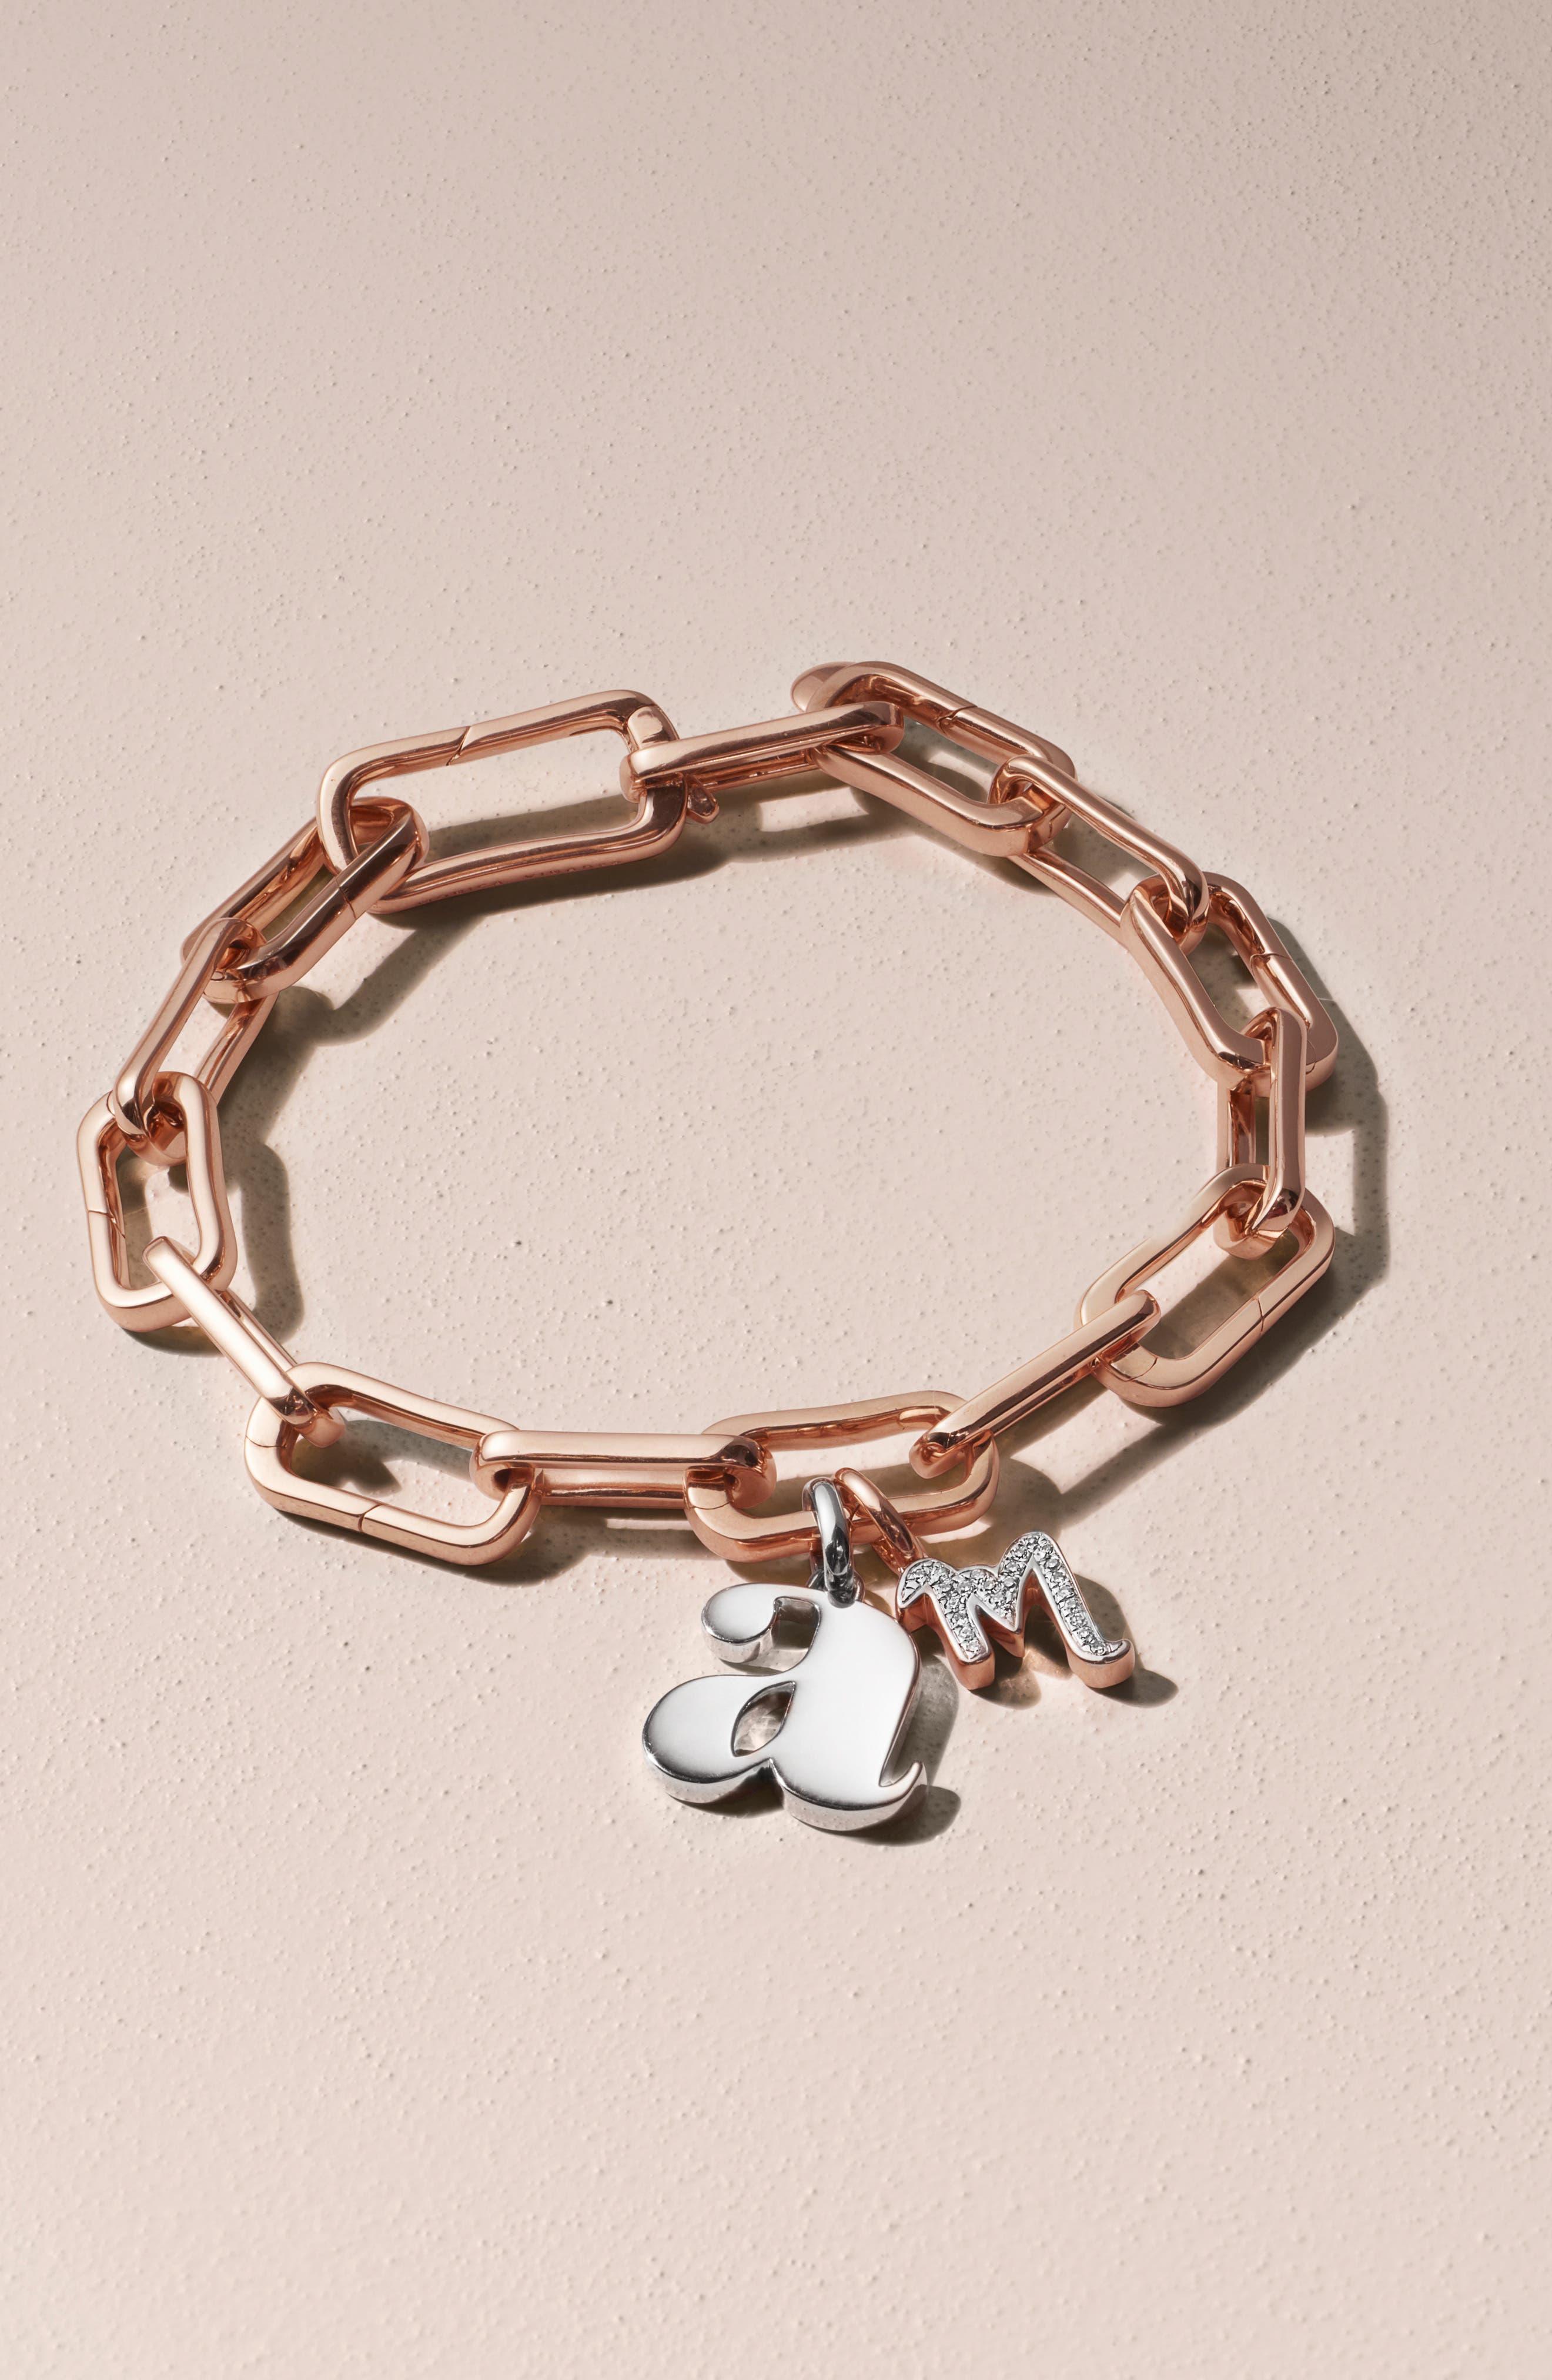 Alta Capture Link Chain Bracelet,                             Alternate thumbnail 7, color,                             ROSE GOLD